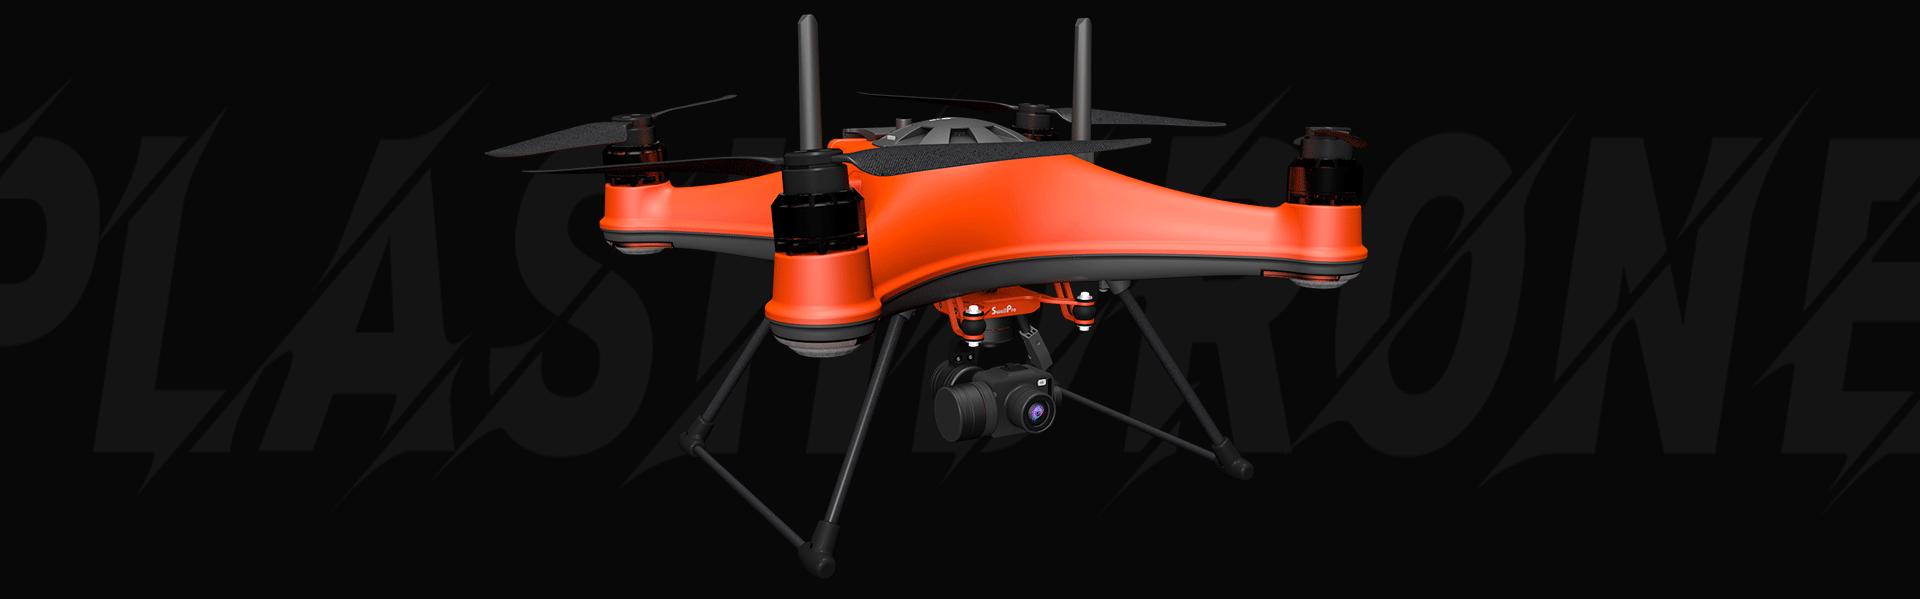 SplashDrone 4 - A new benchmark for waterproof drones